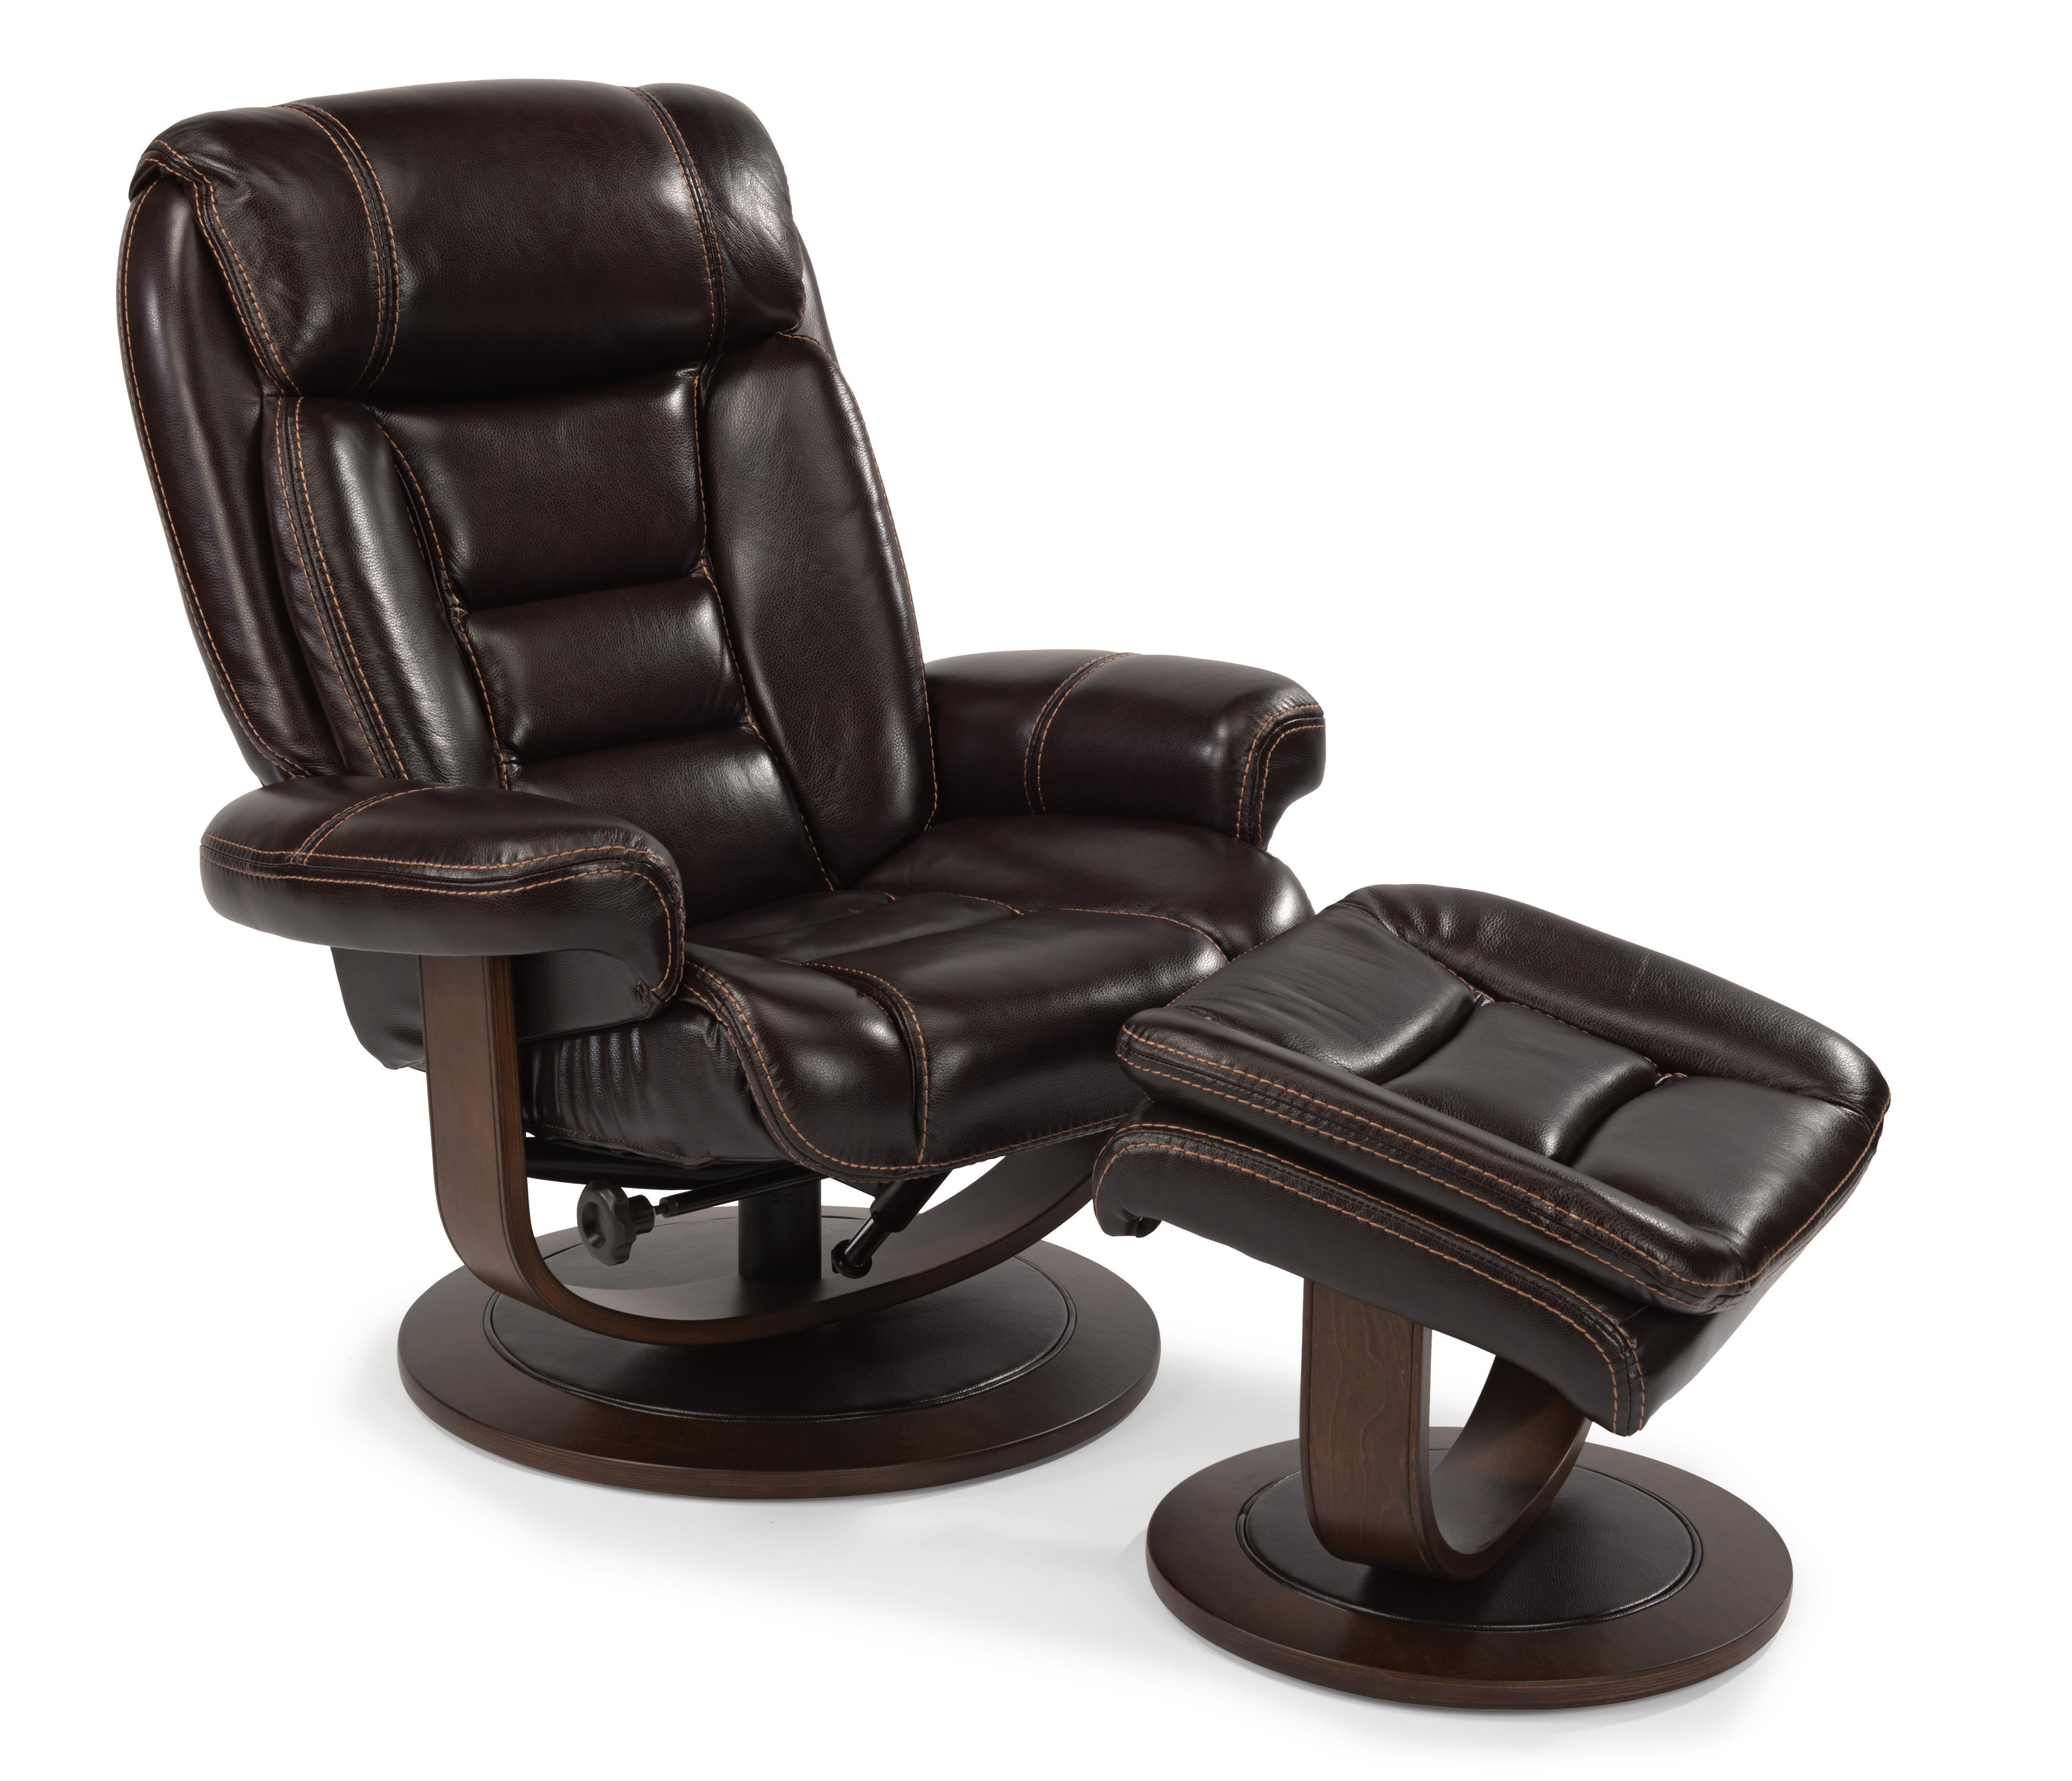 reclining chair and ottoman lowes cushions outdoor flexsteel latitudes hunter modern zero gravity